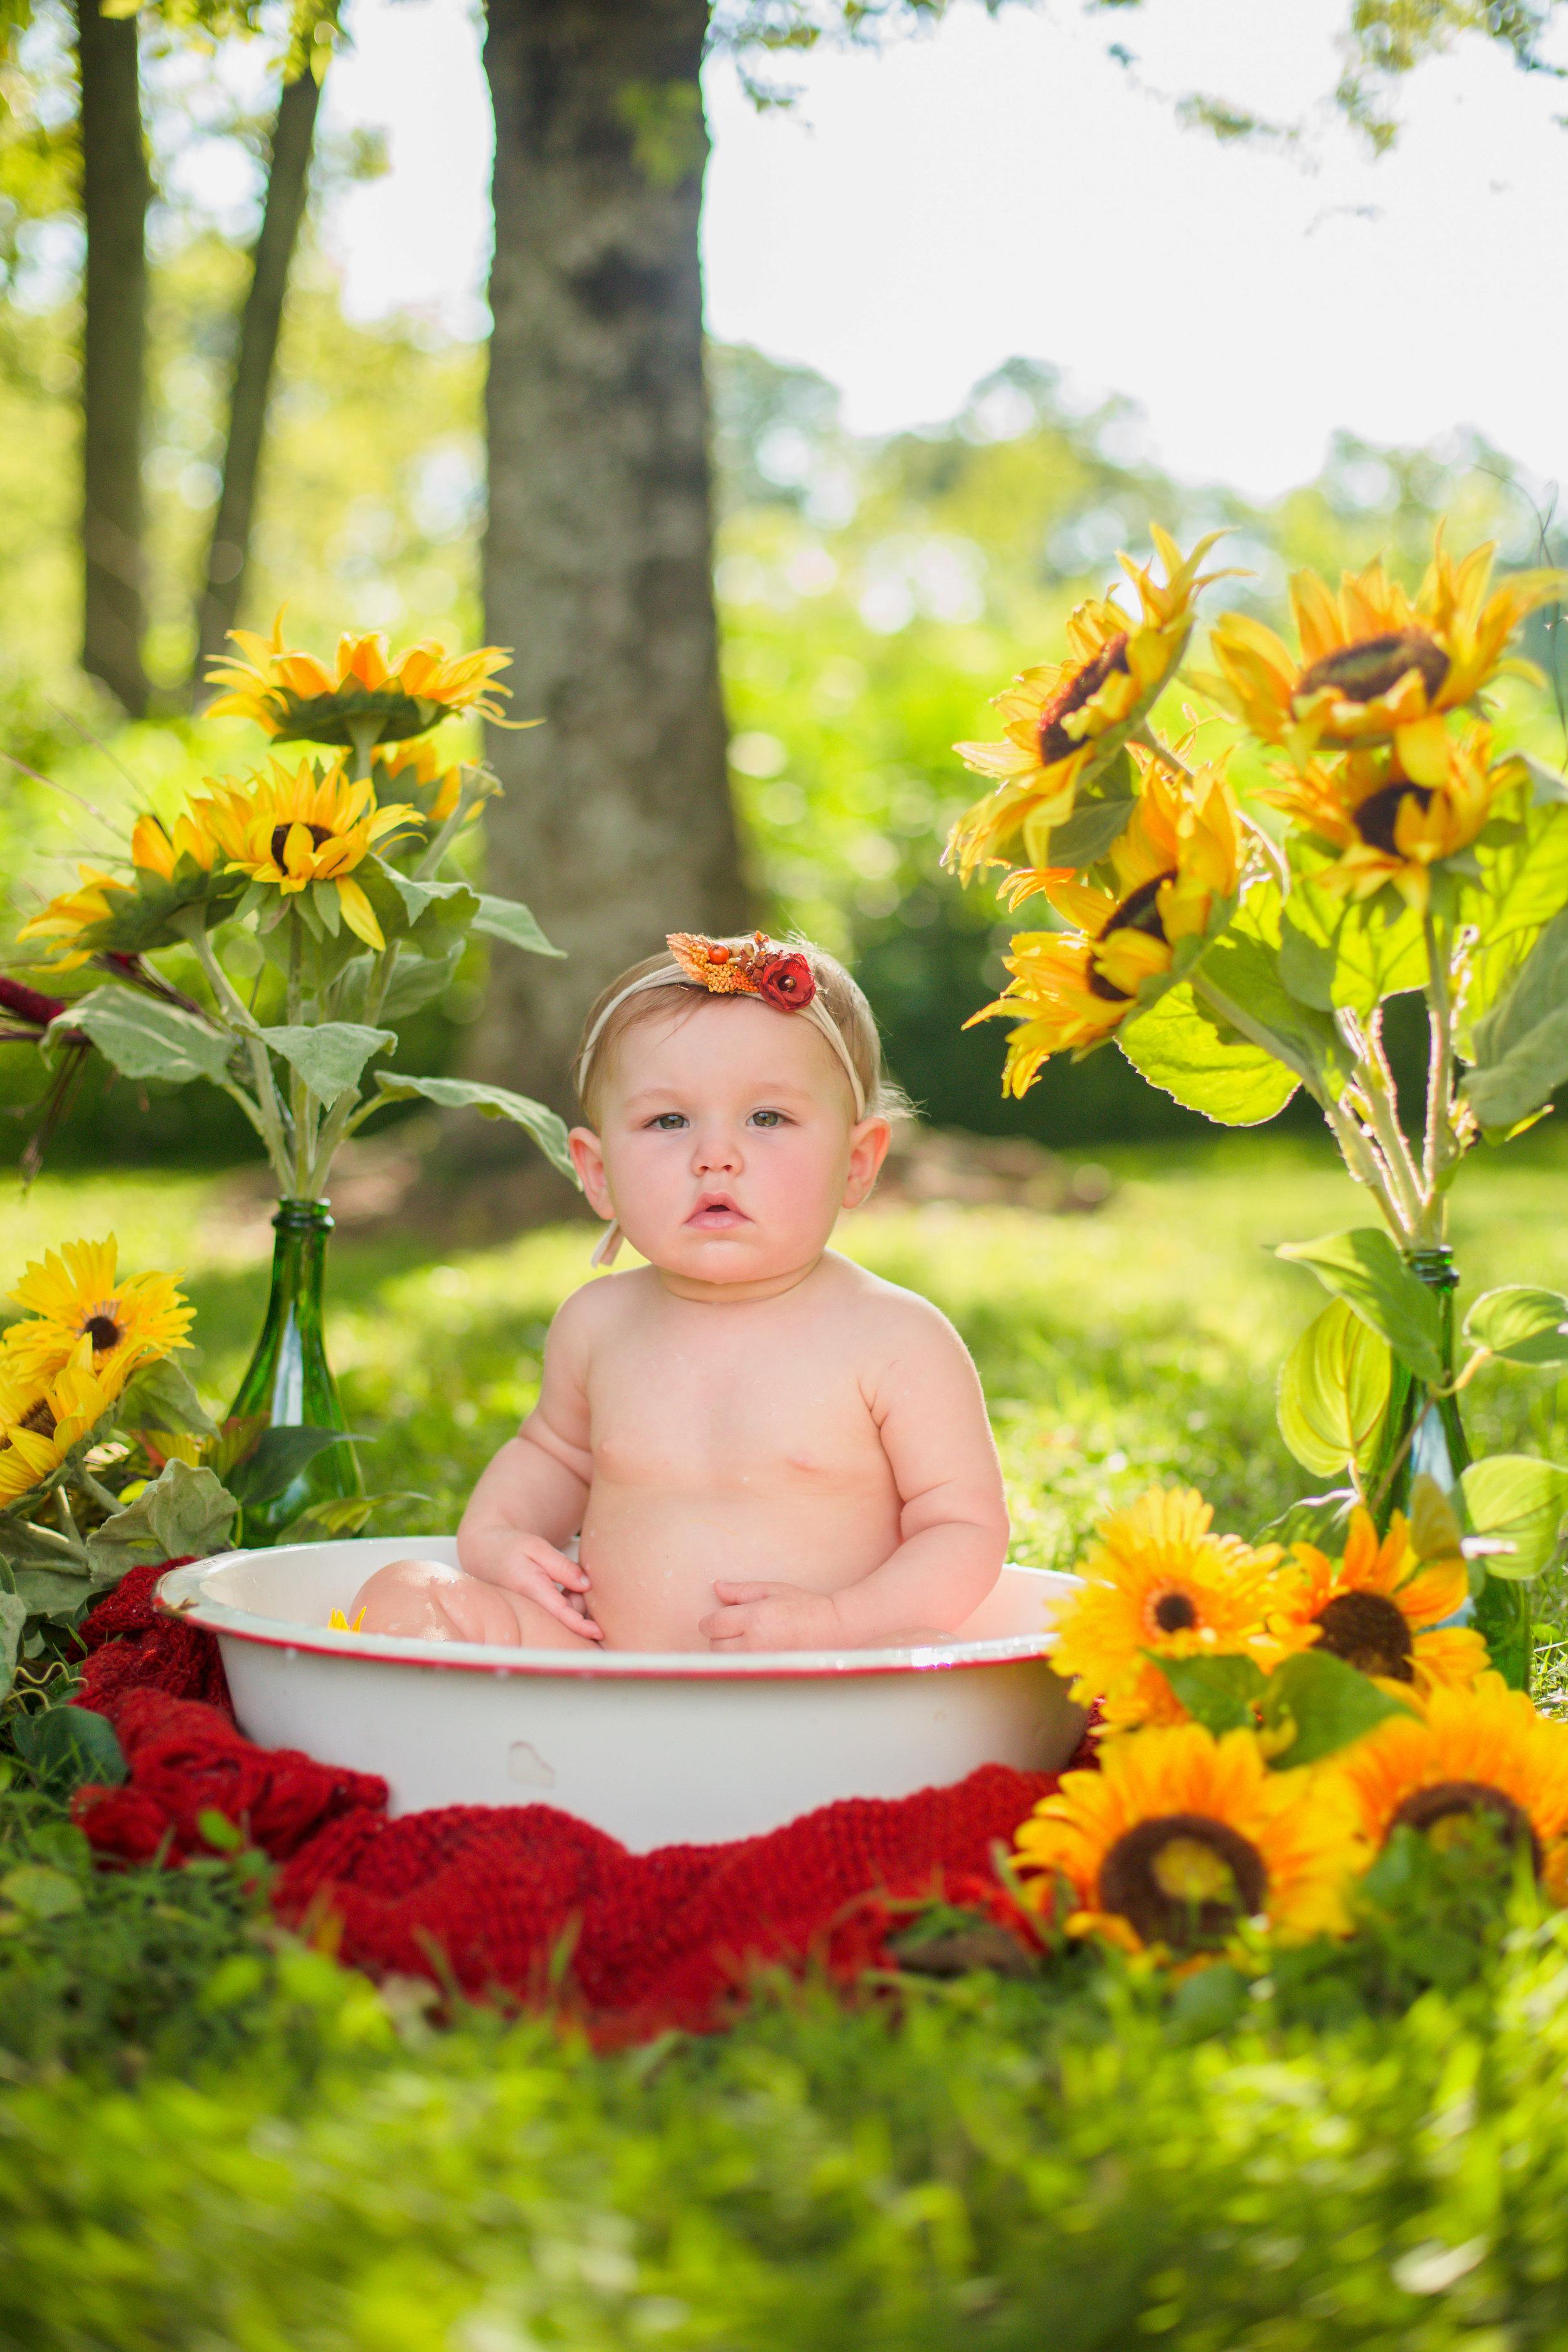 Sawyer-Jo-Sunflower-Milk-bath-Nashville-Family-Photographer-Chelsea-Meadows-Photography-(15).jpg